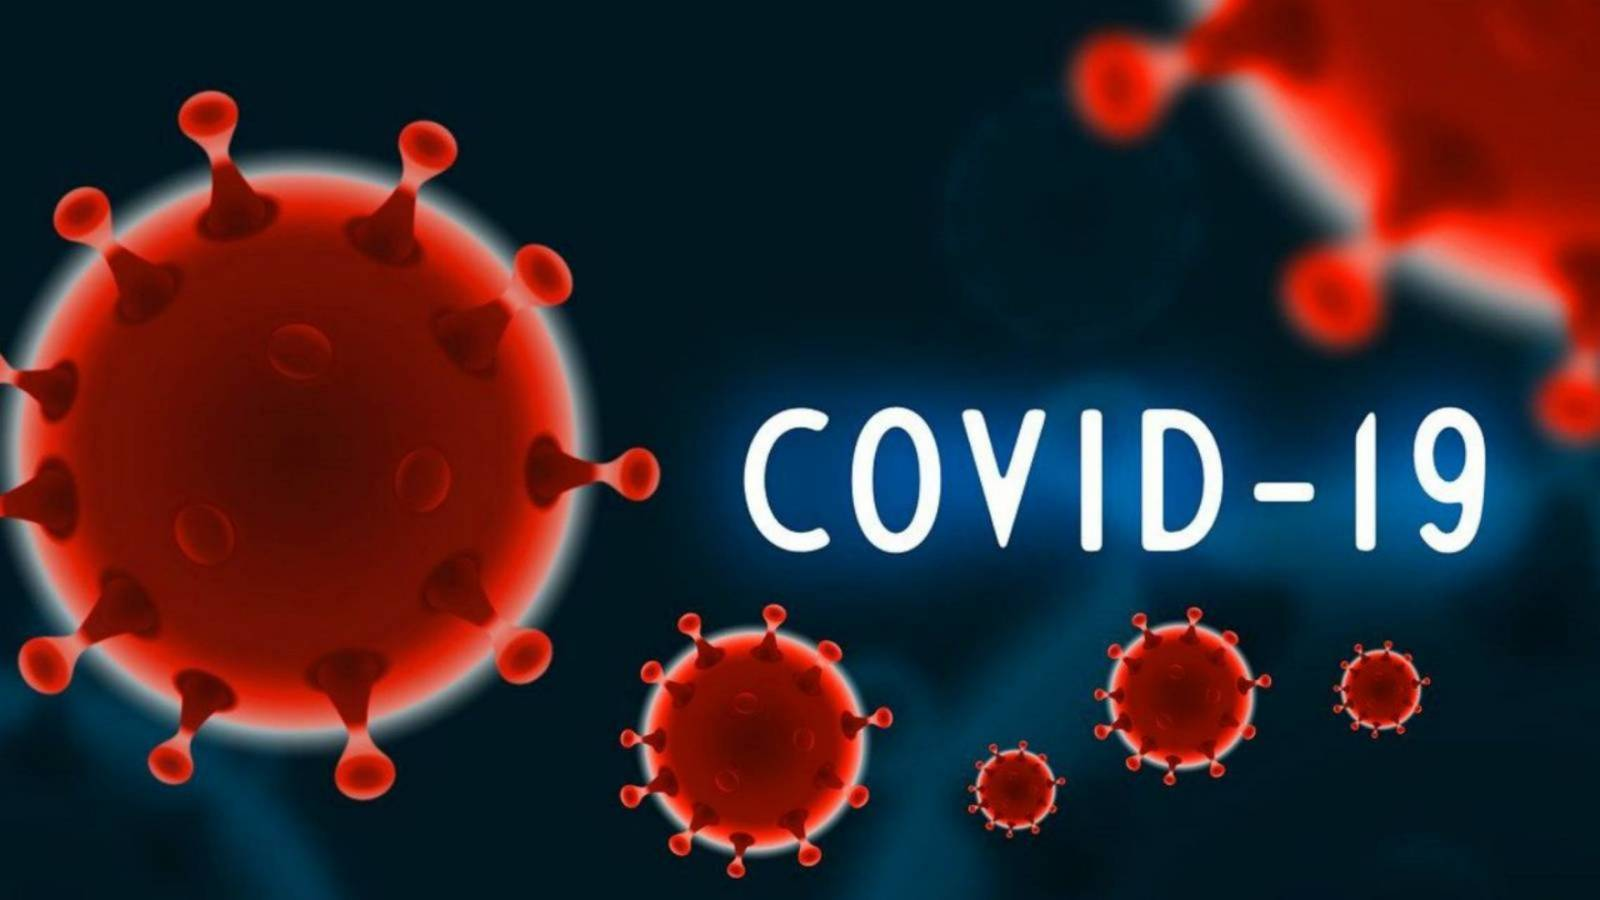 COVID-19 cat Timp dupa Infectare poti Vaccina